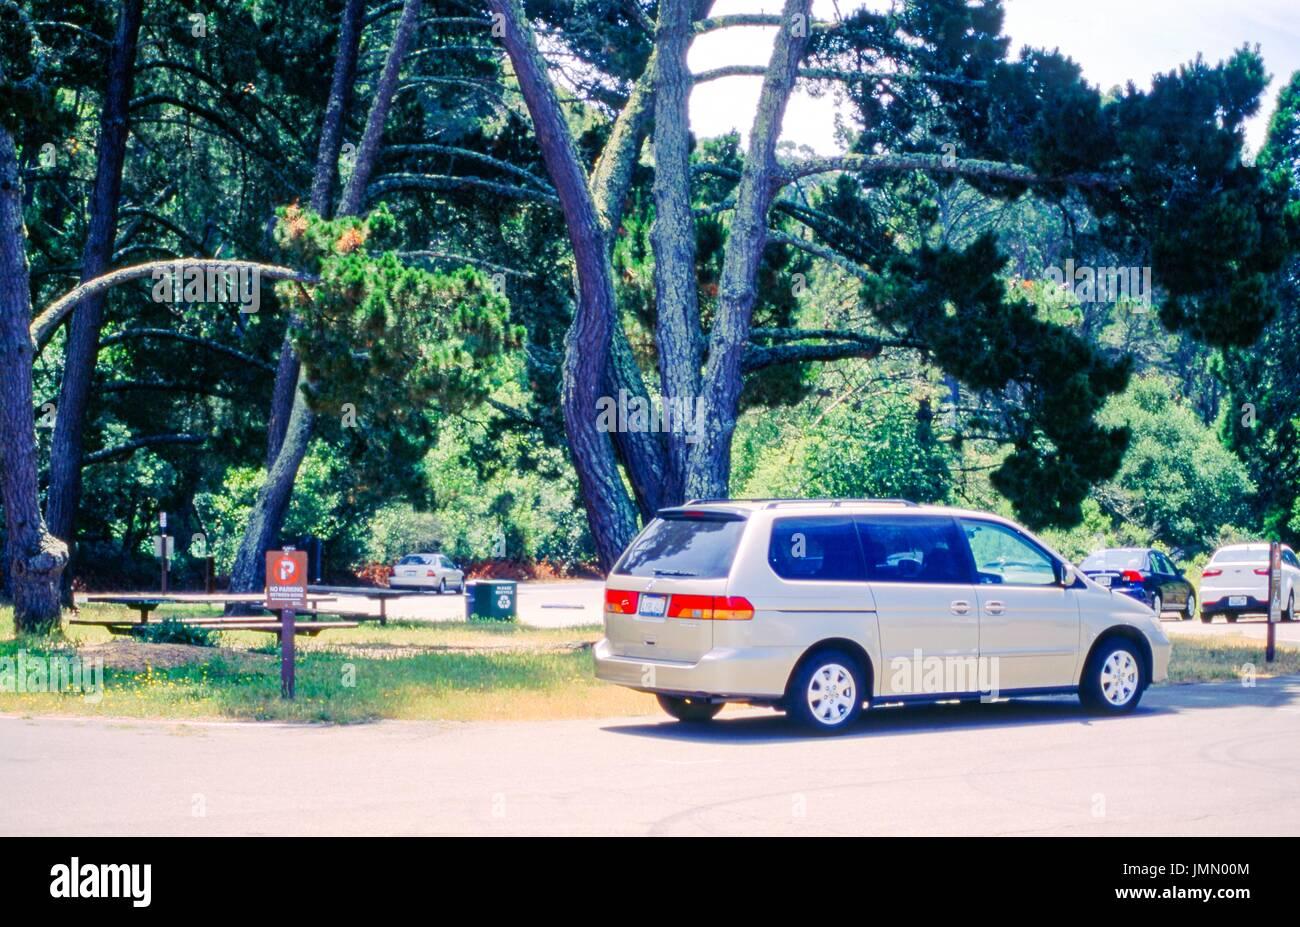 A minivan drives past picnic areas at Inspiration Point, in Tilden Regional Park, Berkeley, California, June 9, - Stock Image